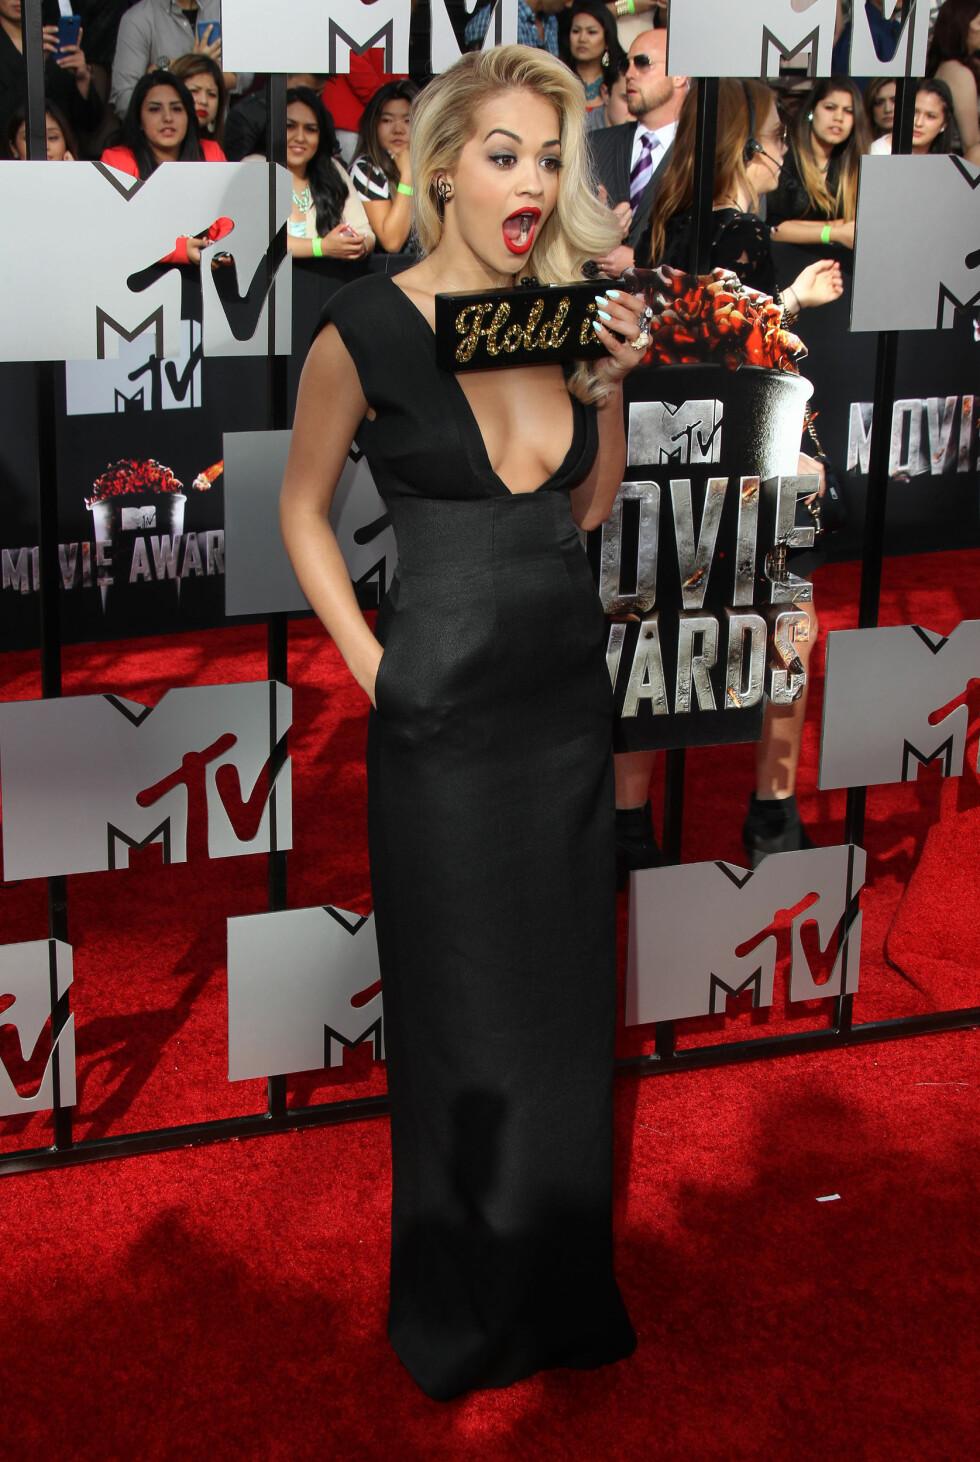 Rita Ora Foto: Jen Lowery / Splash News/ All Over Press